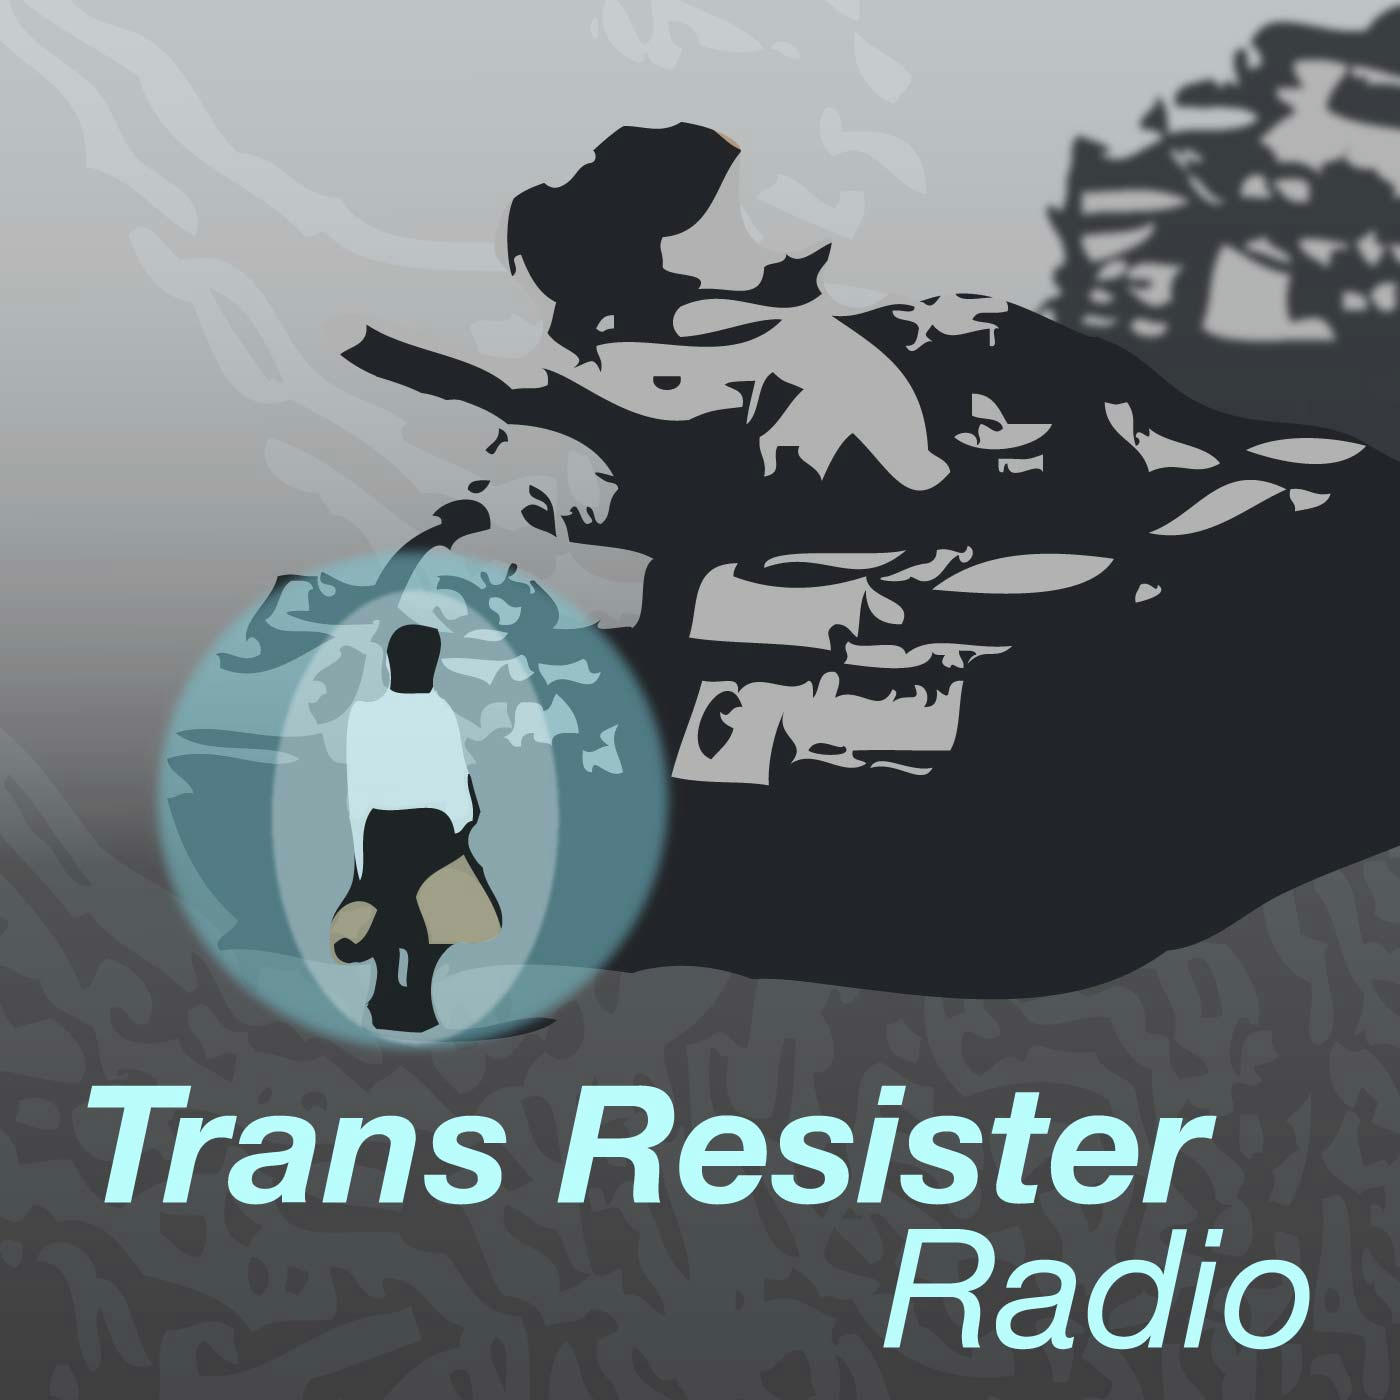 Transresister Radio #226 Pearse Redmond interview, Porkins' Policies